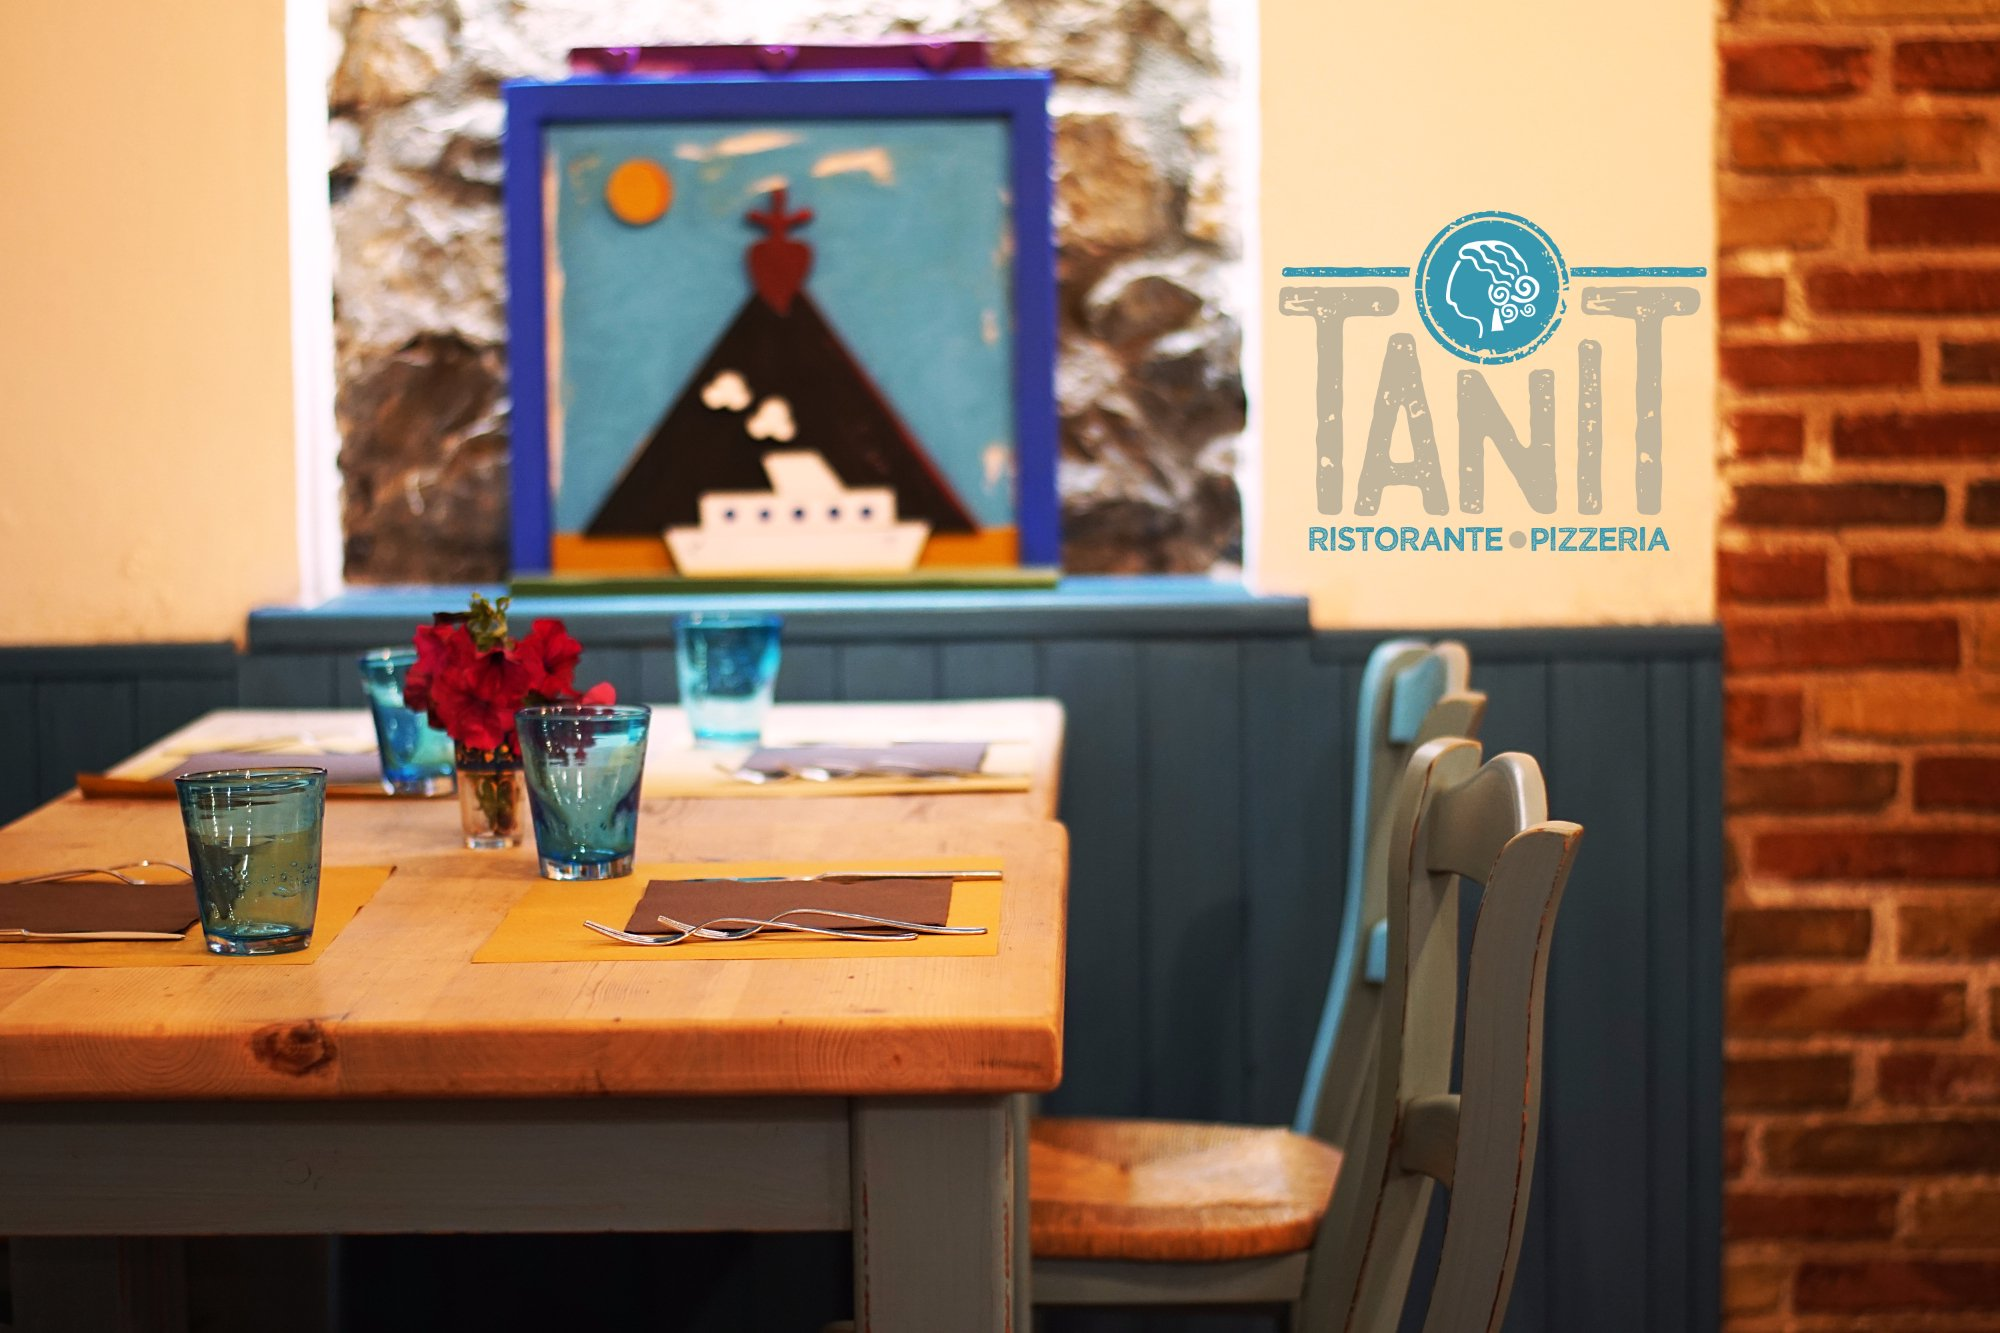 Tanit, Santa Flavia